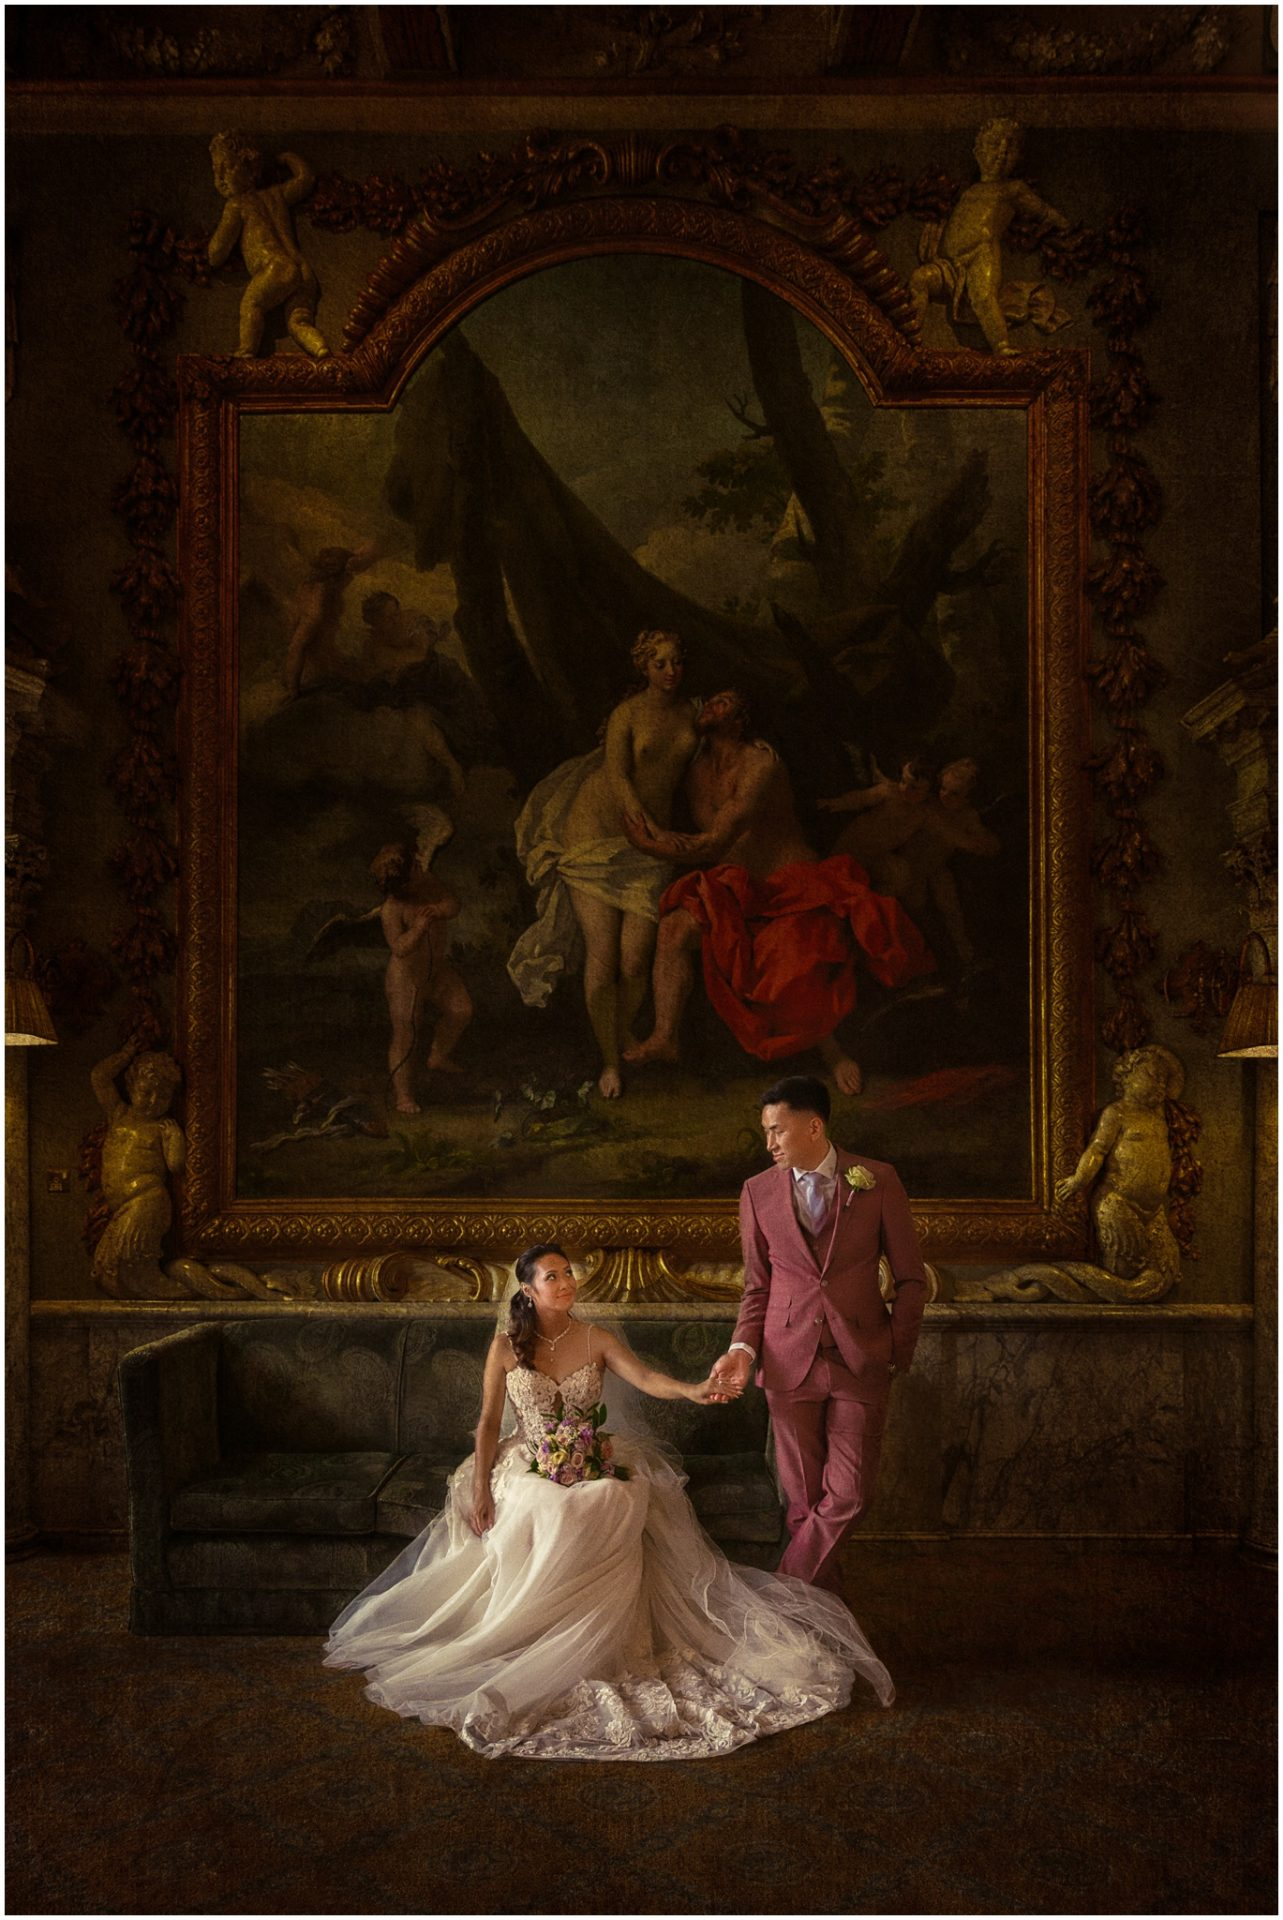 Bride-and-groom-hold-hands-inside-a-room-at-Moor-Park-wedding-venue-in-Hertfordshire